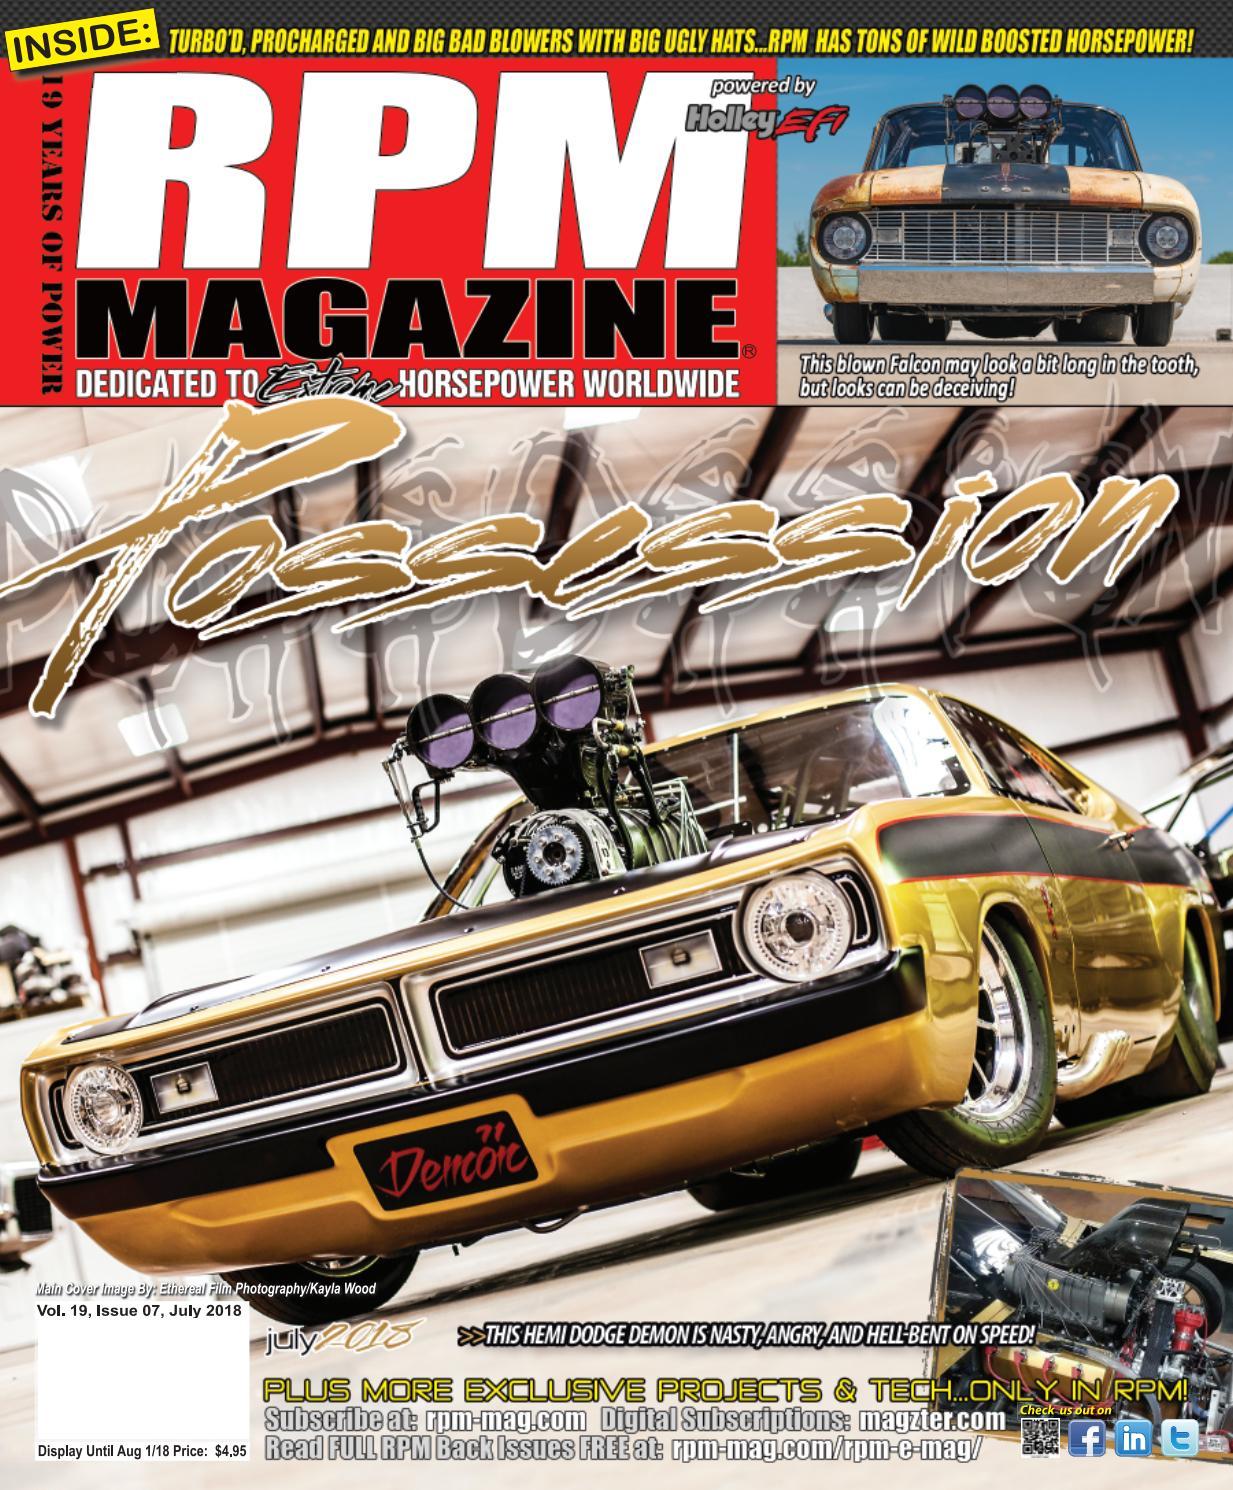 RPM Magazine July 2018 by RPM Magazine - issuu